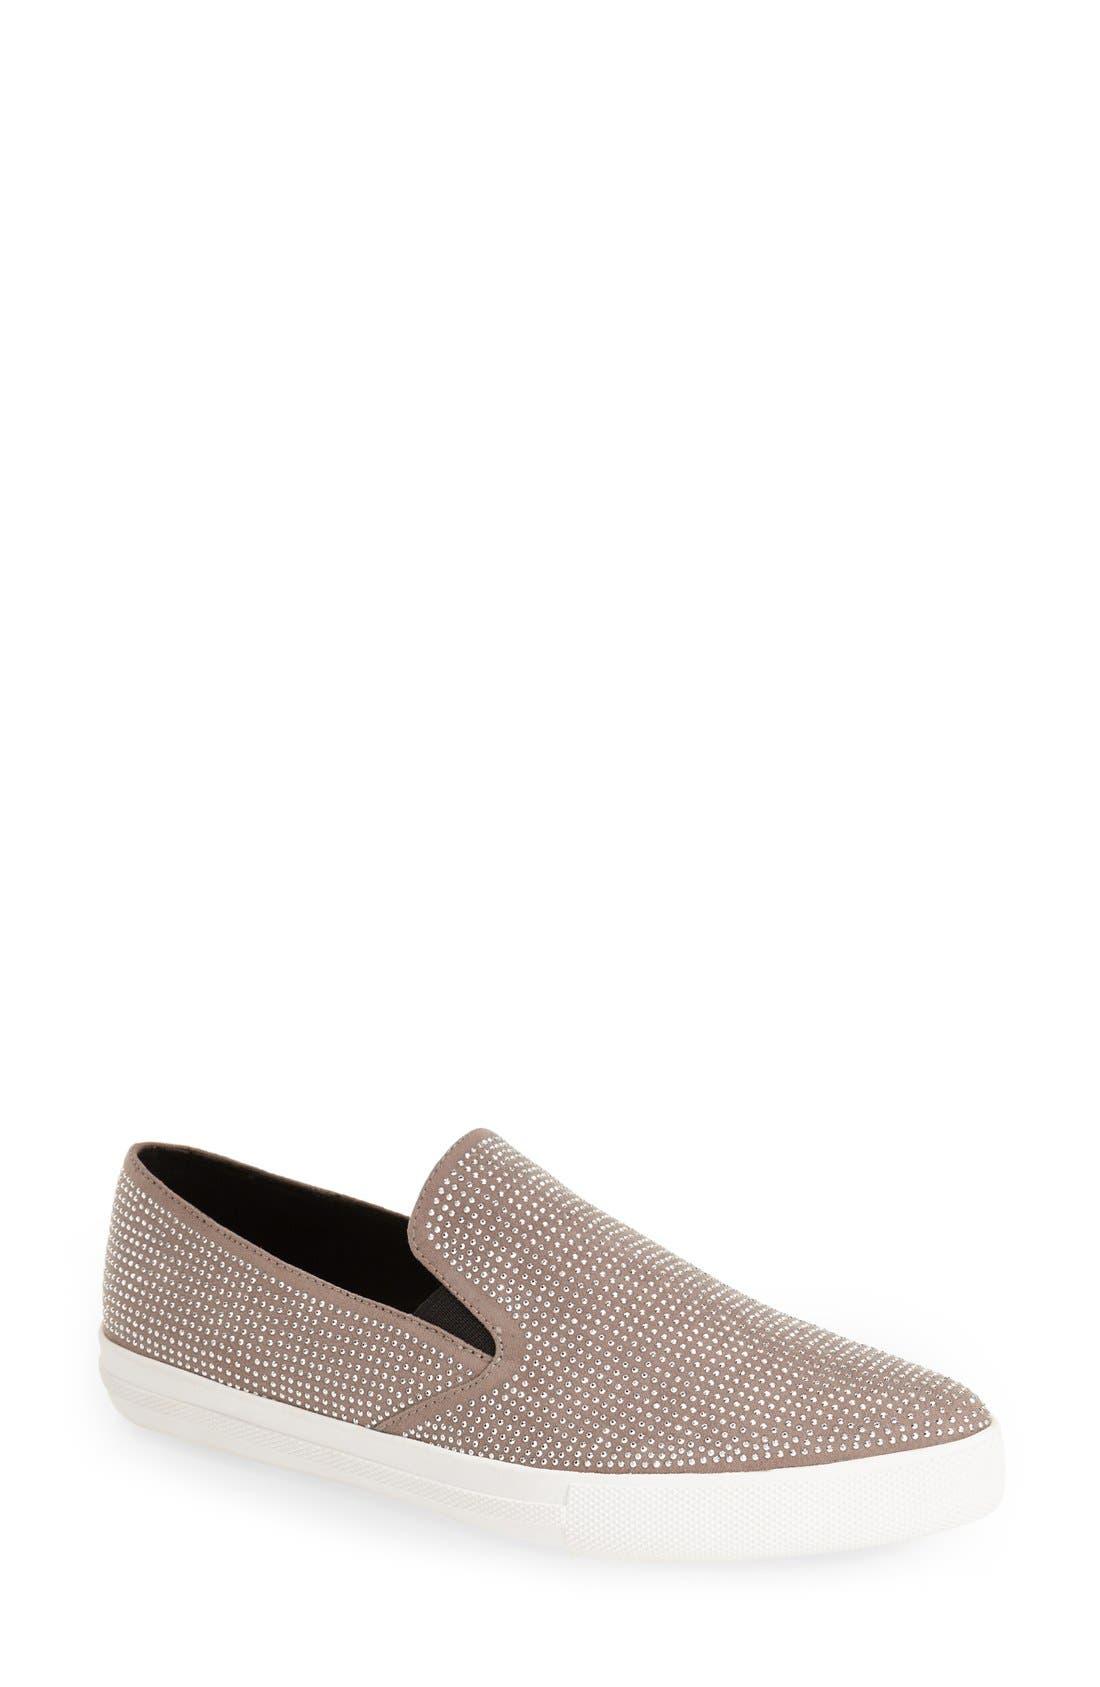 Alternate Image 1 Selected - Kristin Cavallari 'Outcome' Embellished Slip-On Sneaker (Women)